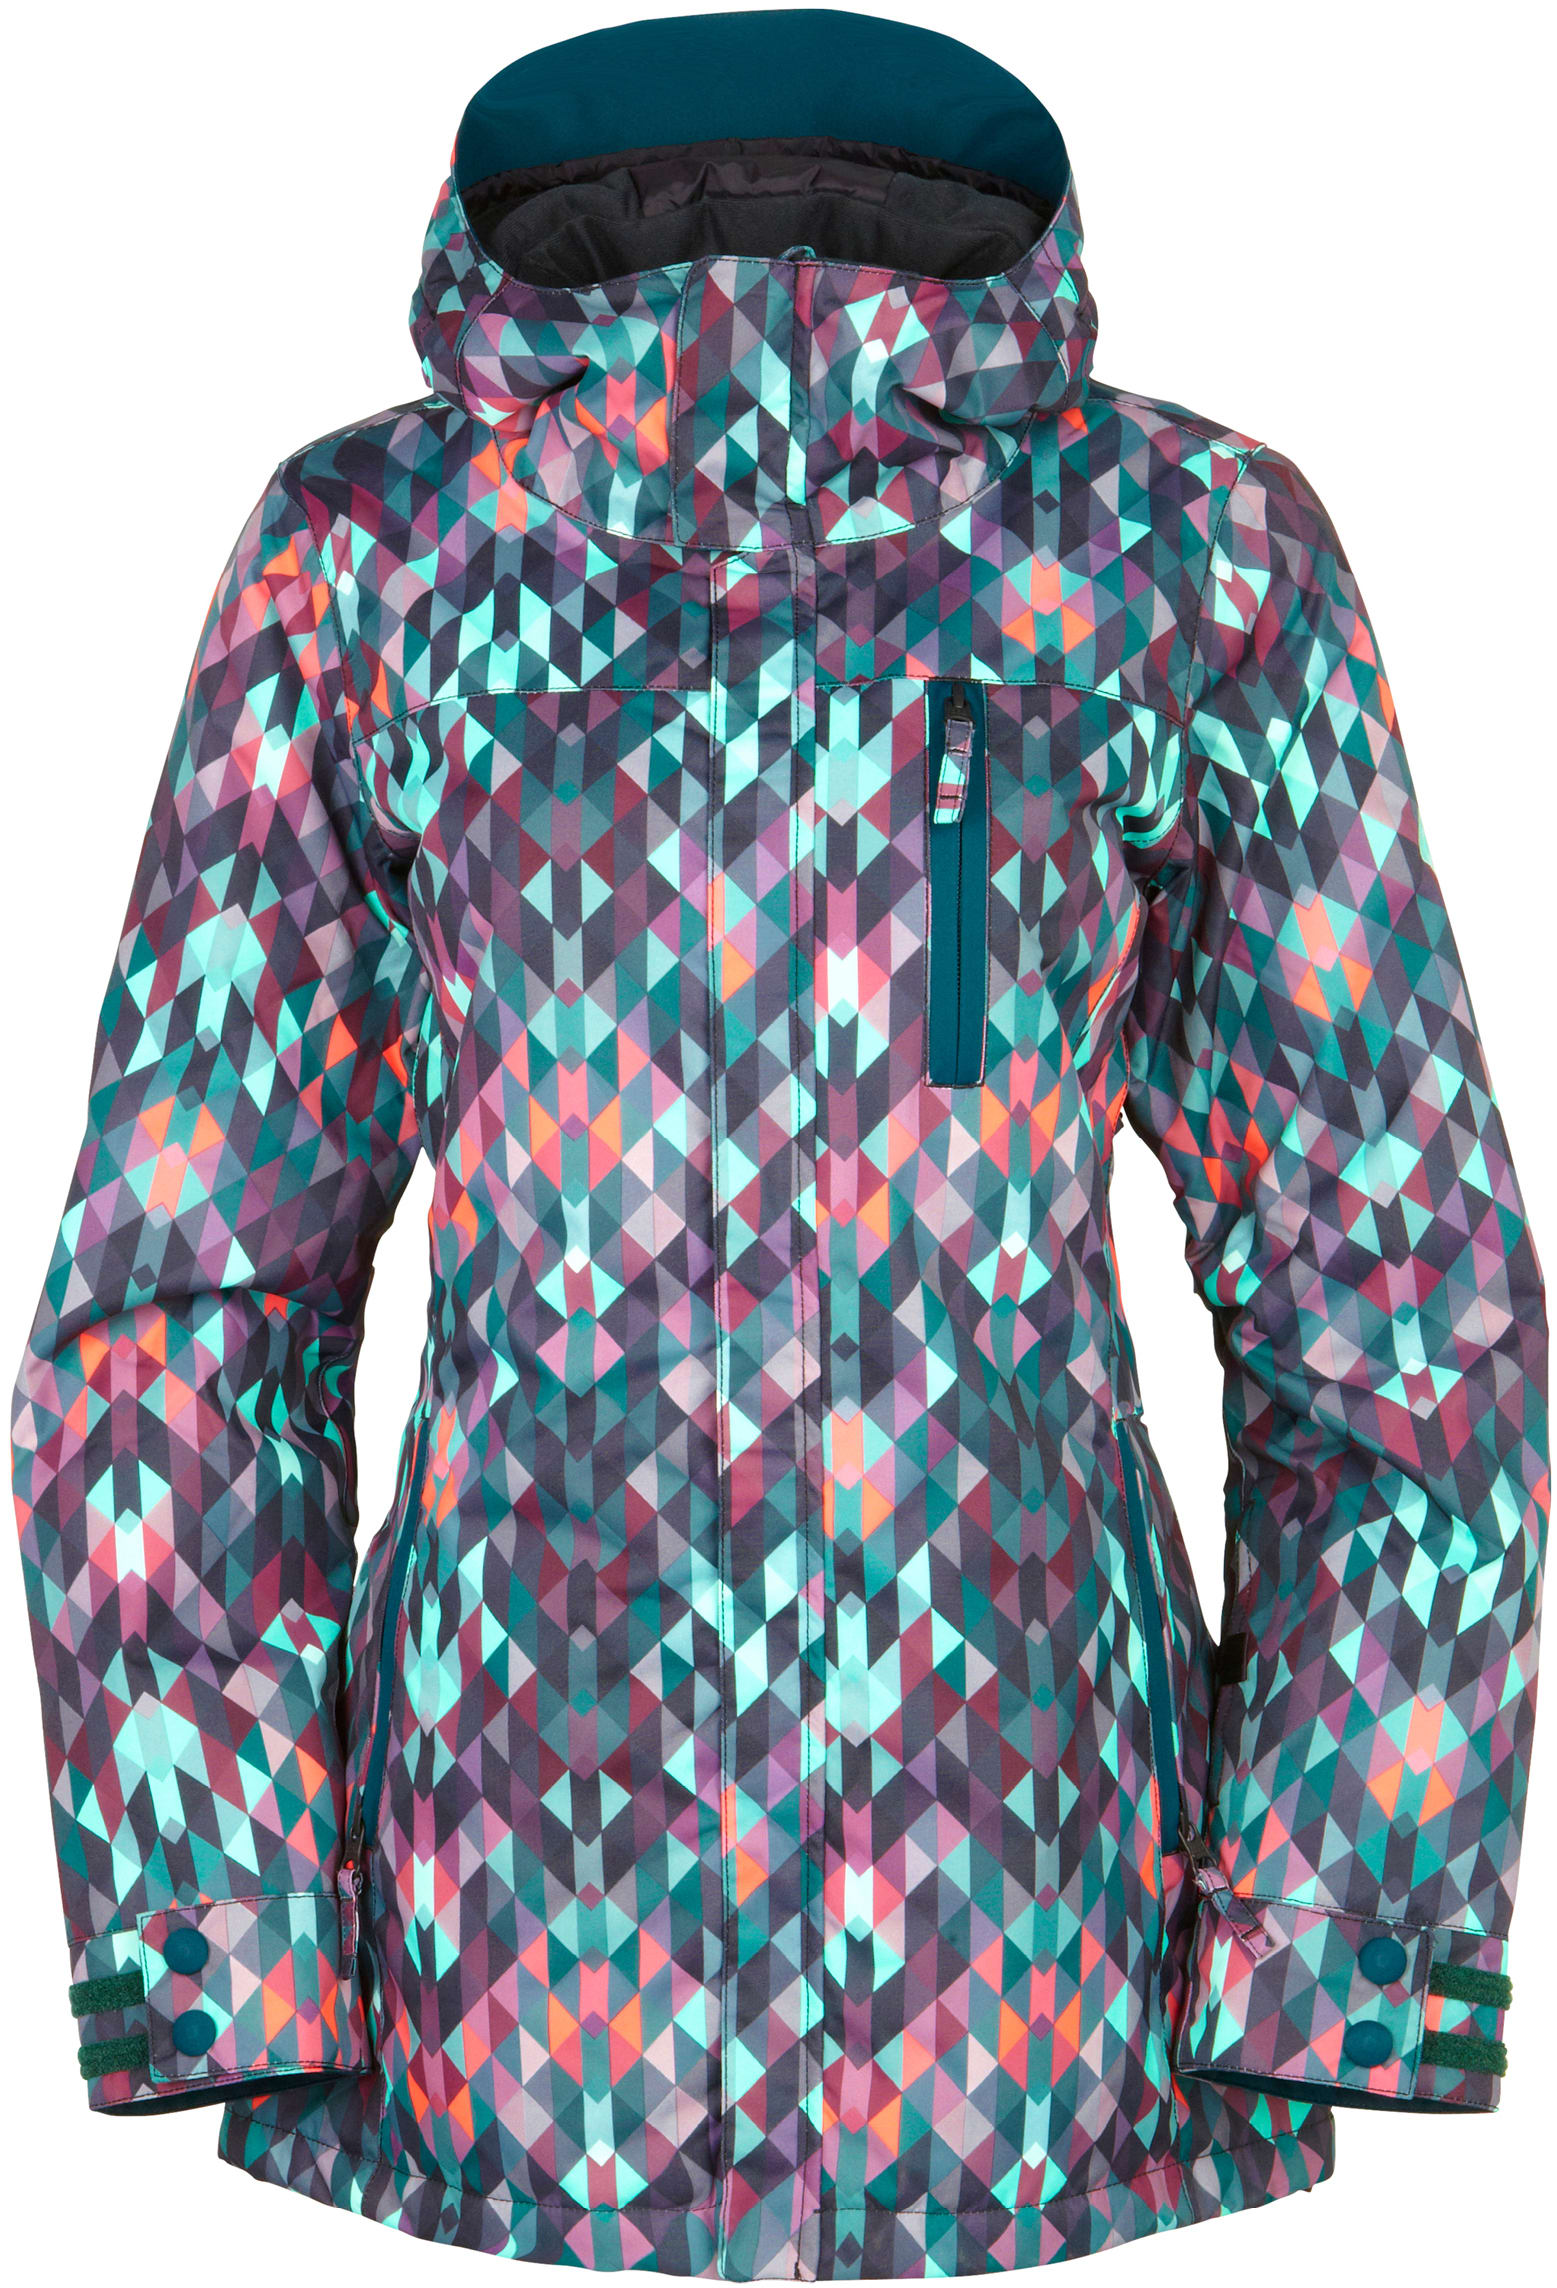 5a110d4876 686 Smarty Haven Snowboard Jacket - thumbnail 1